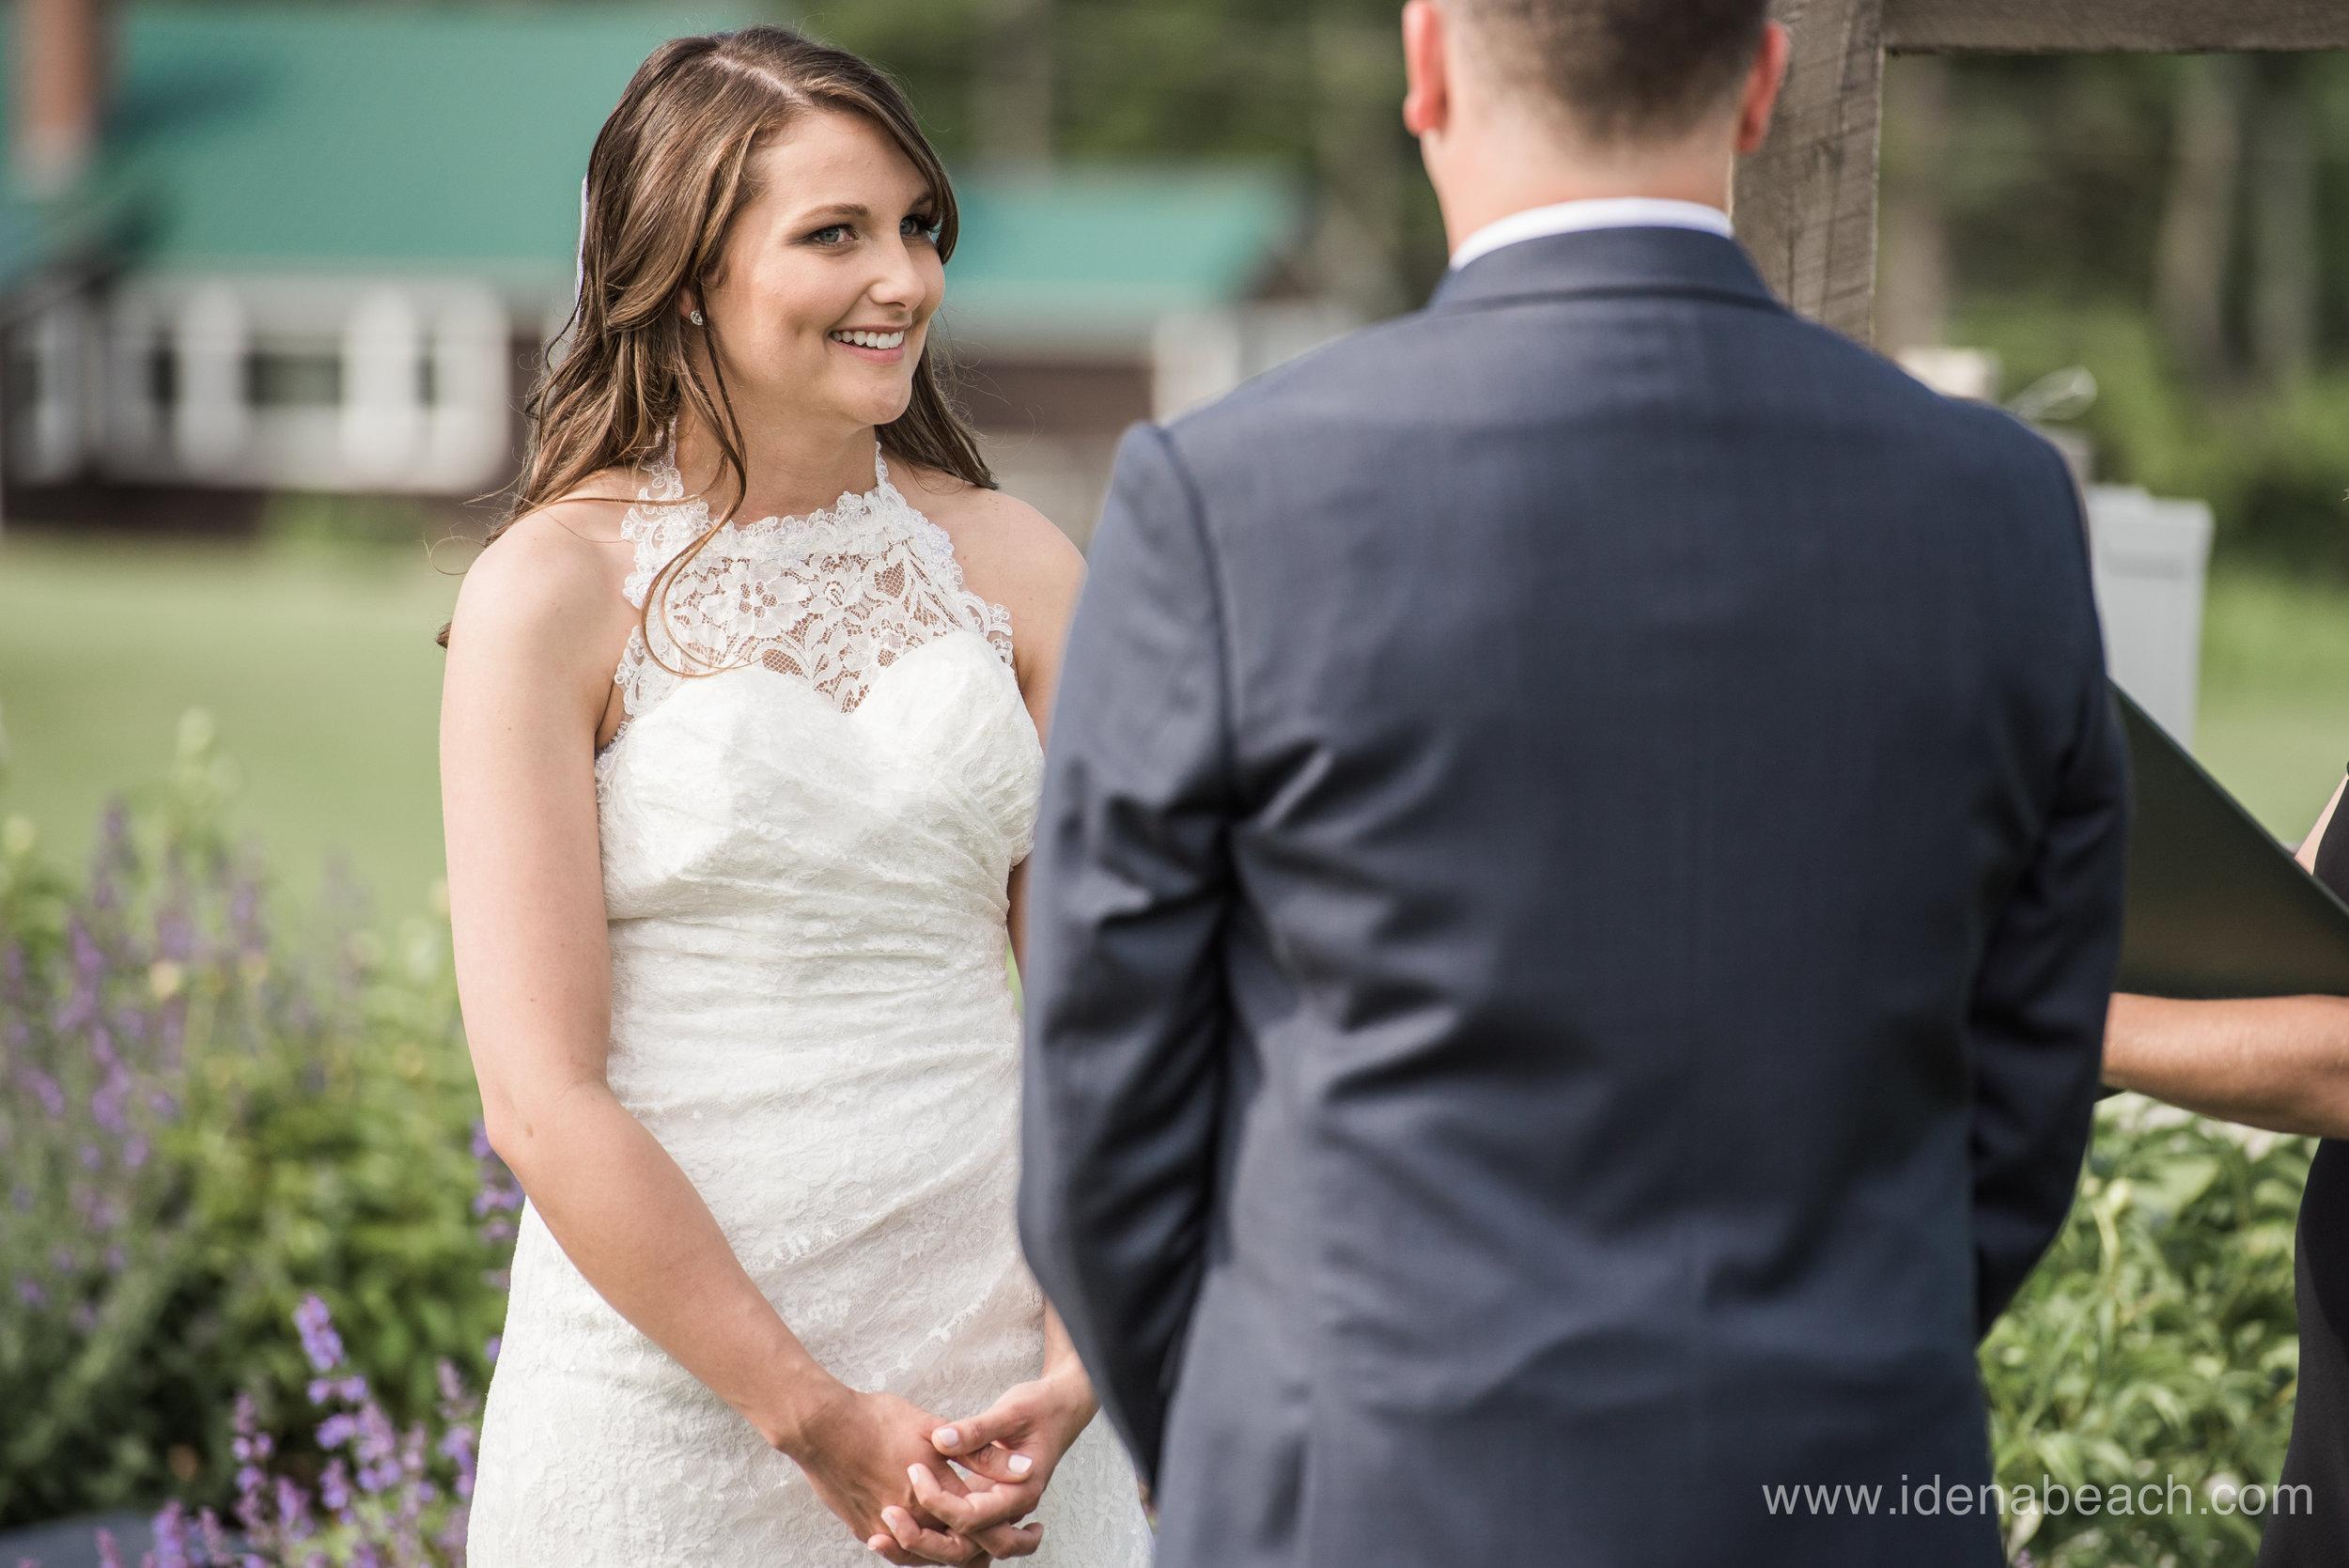 Mountain-Top-Inn-Vermont-Wedding-Photographer-48.jpg